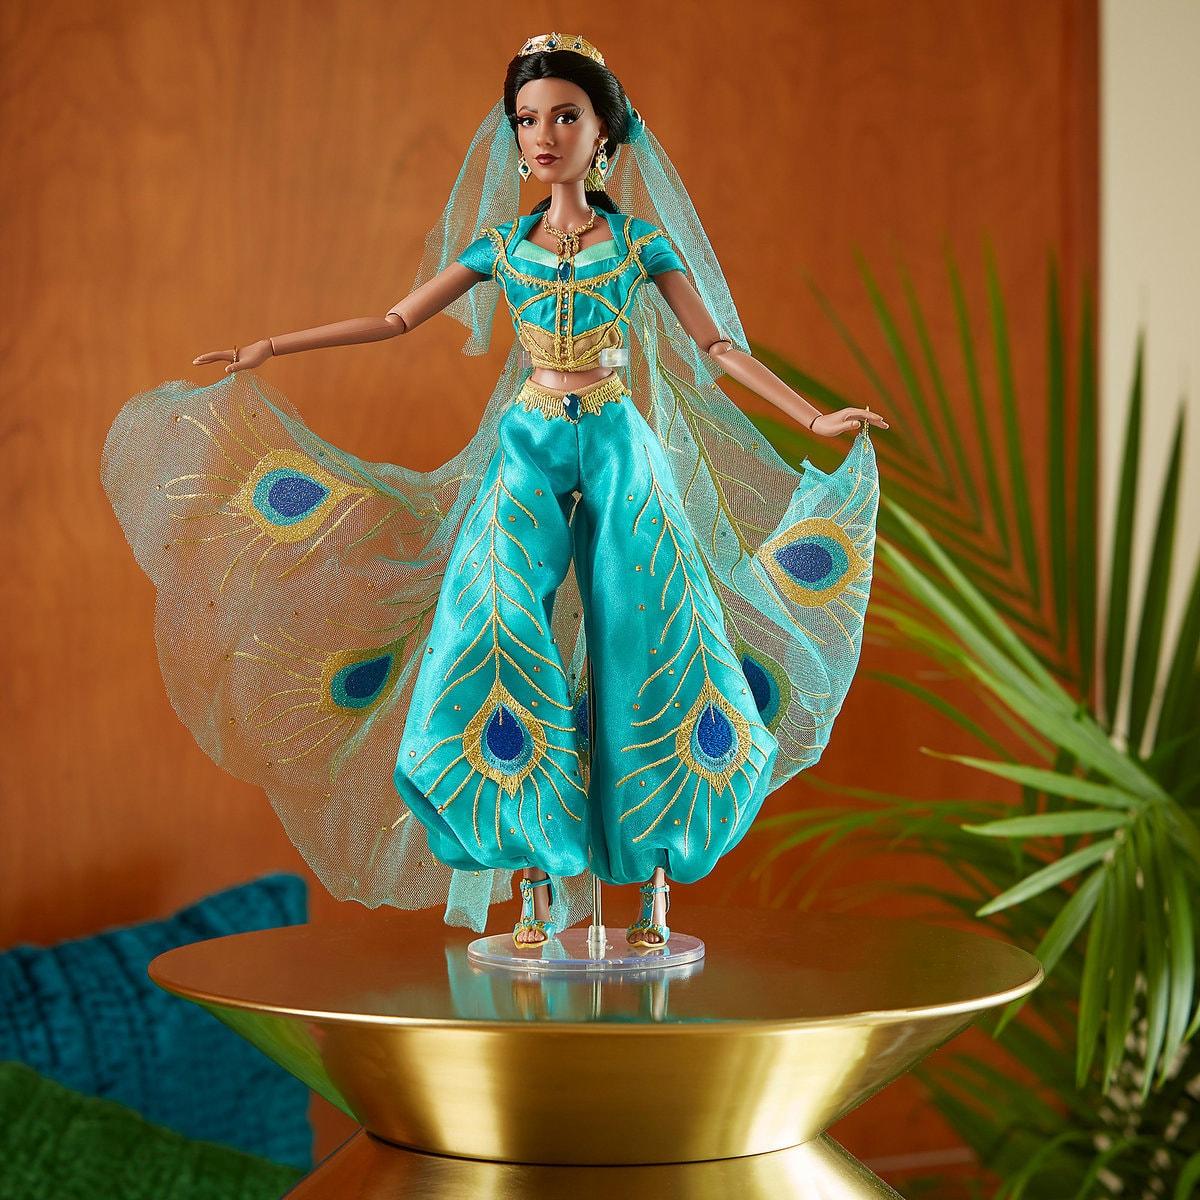 Limited Edition Aladdin Dolls Out Now Diskingdom Com